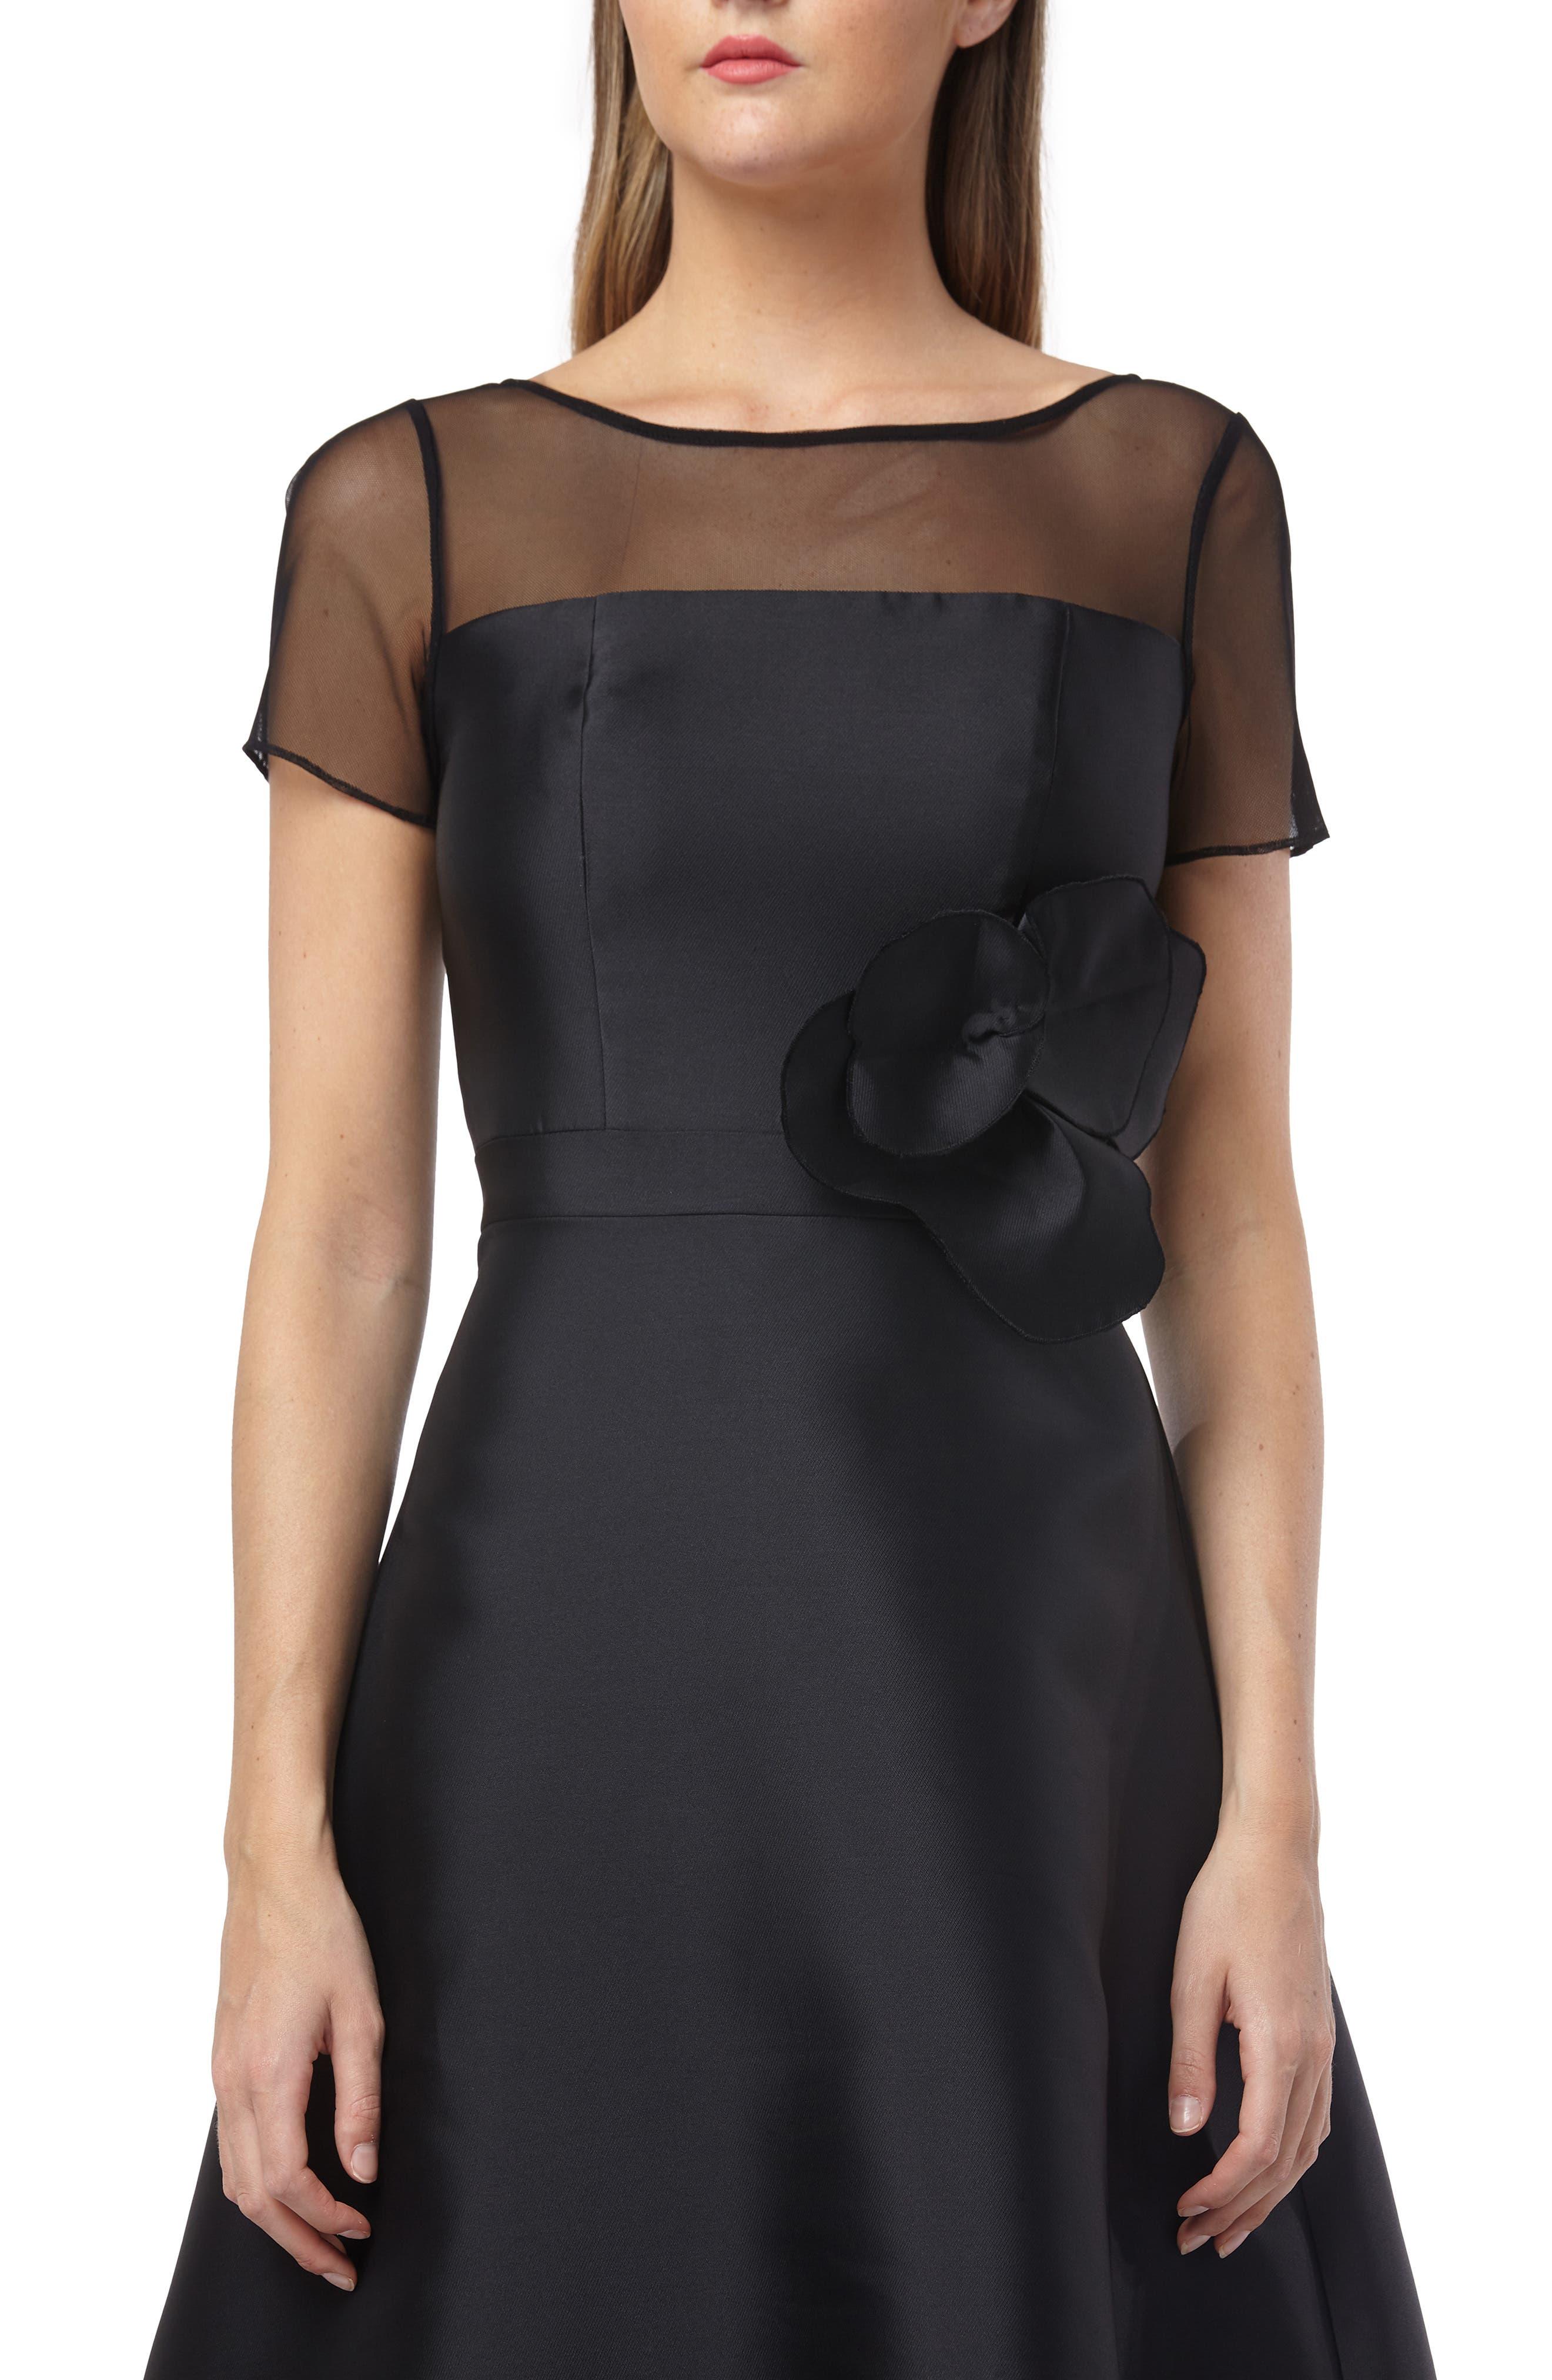 KAY UNGER,                             Illusion Yoke Fit & Flare Cocktail Dress,                             Alternate thumbnail 4, color,                             BLACK